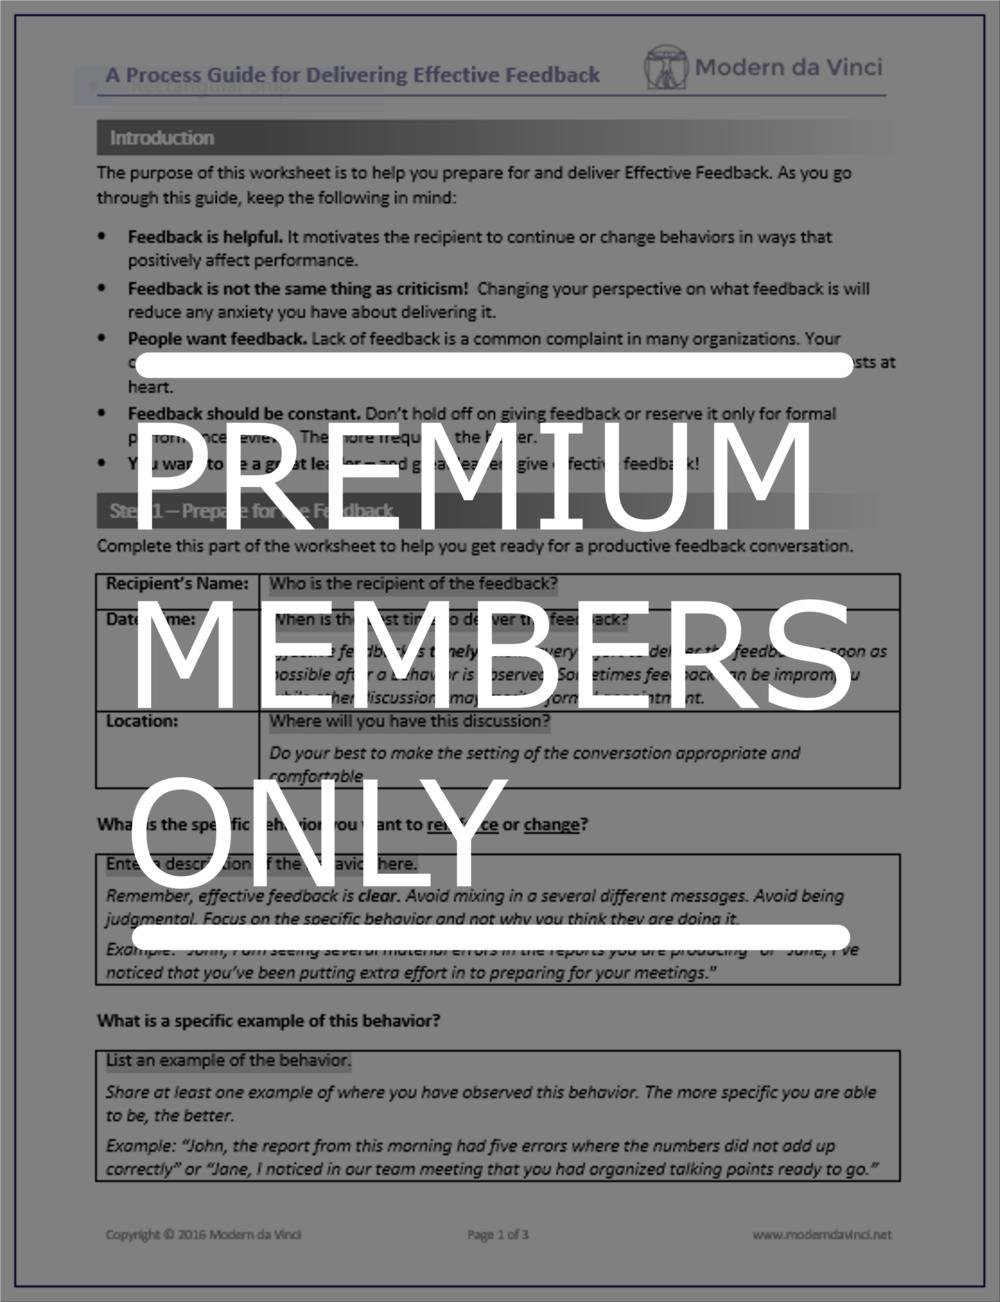 [Premium Members] Effective Feedback Process Guide Template Download Here >